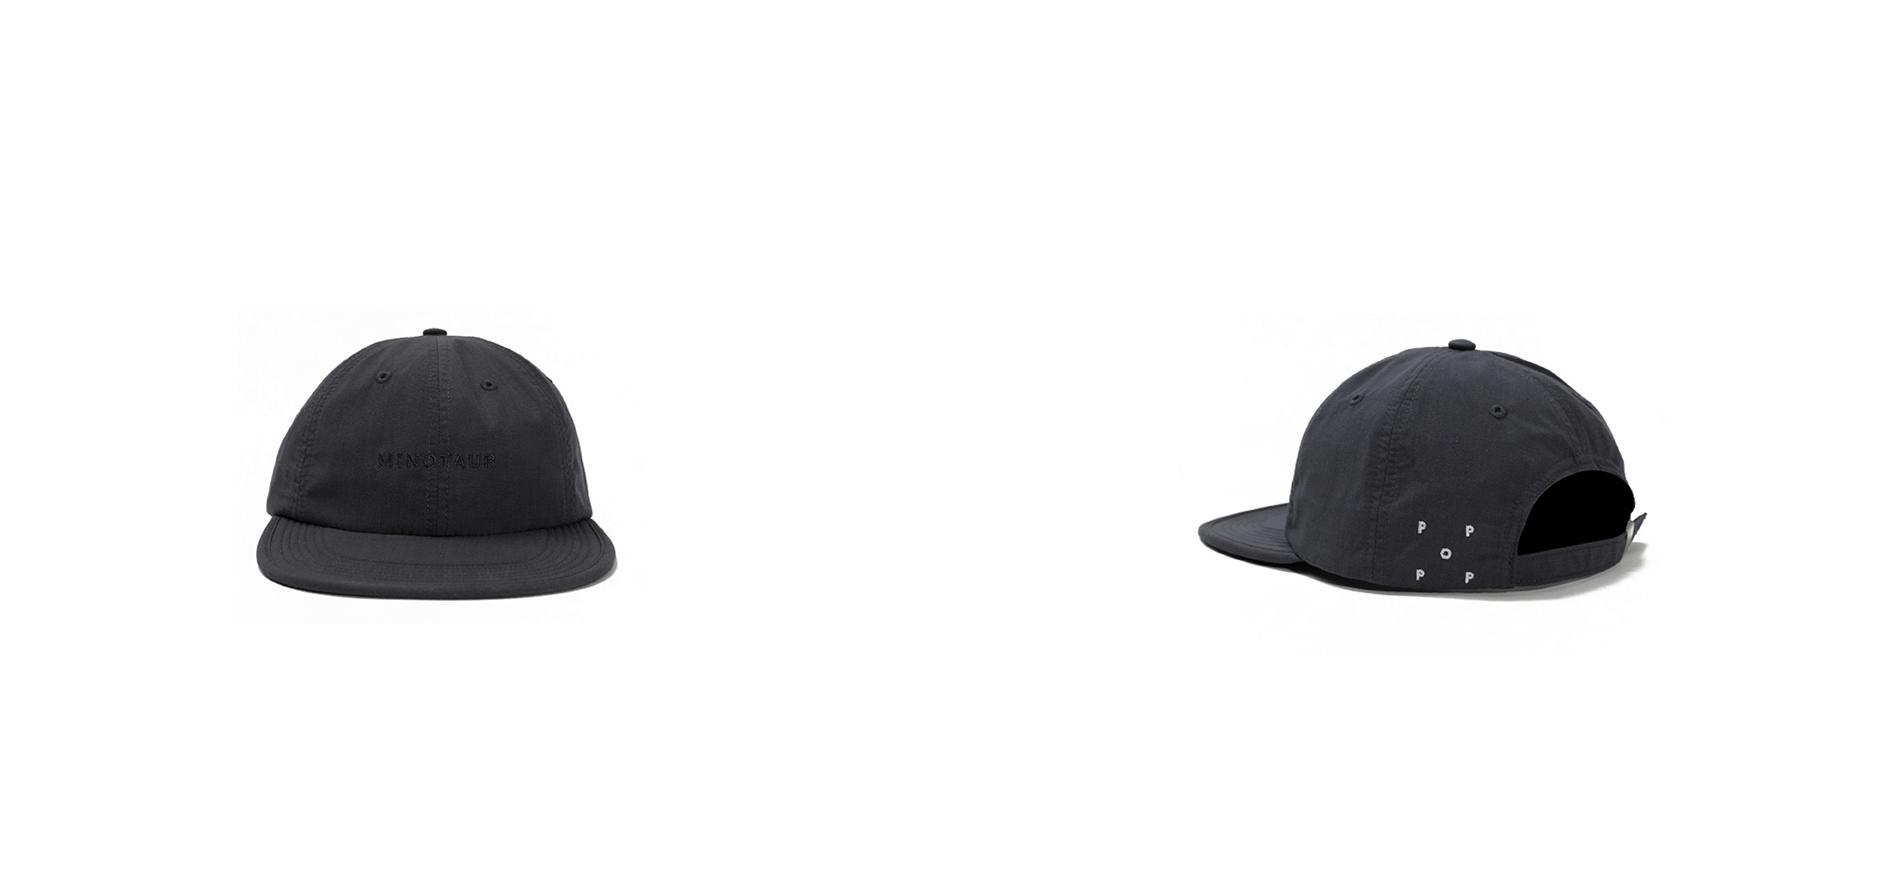 pop-trading-company-minotaur-anti-friction-hat